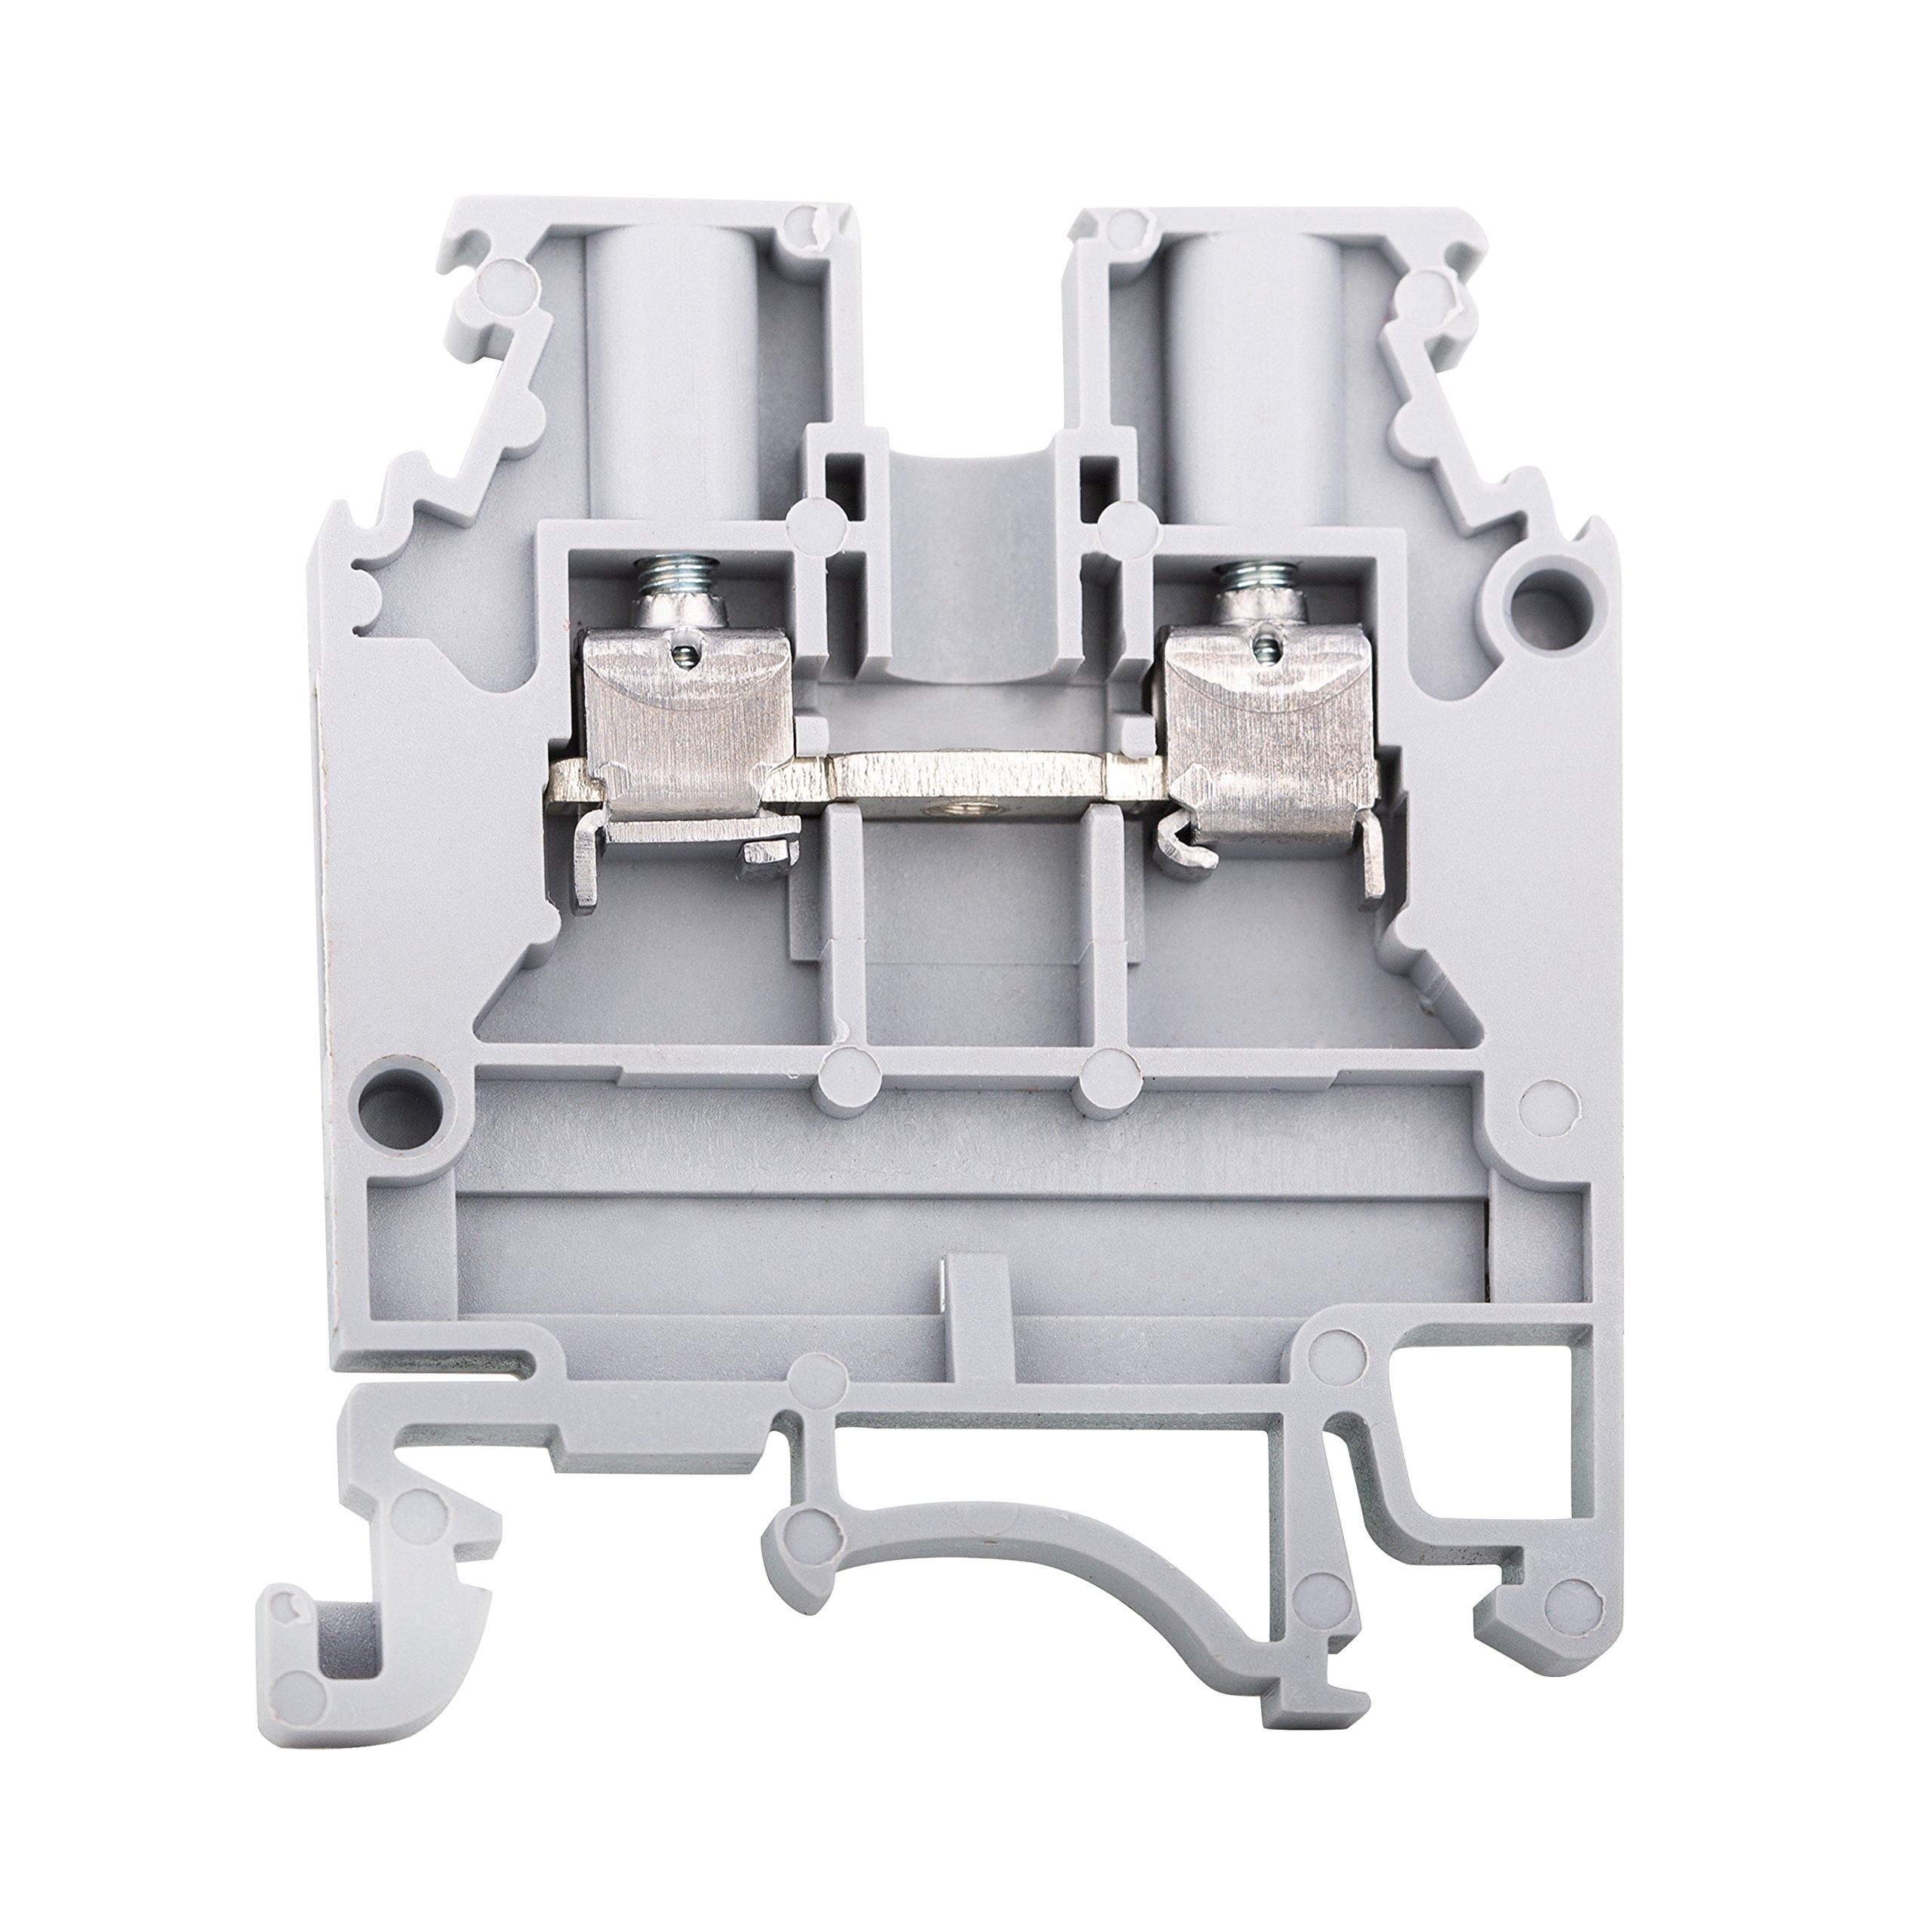 Elmex Grey KUT2.5N DIN Rail Terminal Block Screw Type UL 600V 20A 12-20AWG, Pack of 100